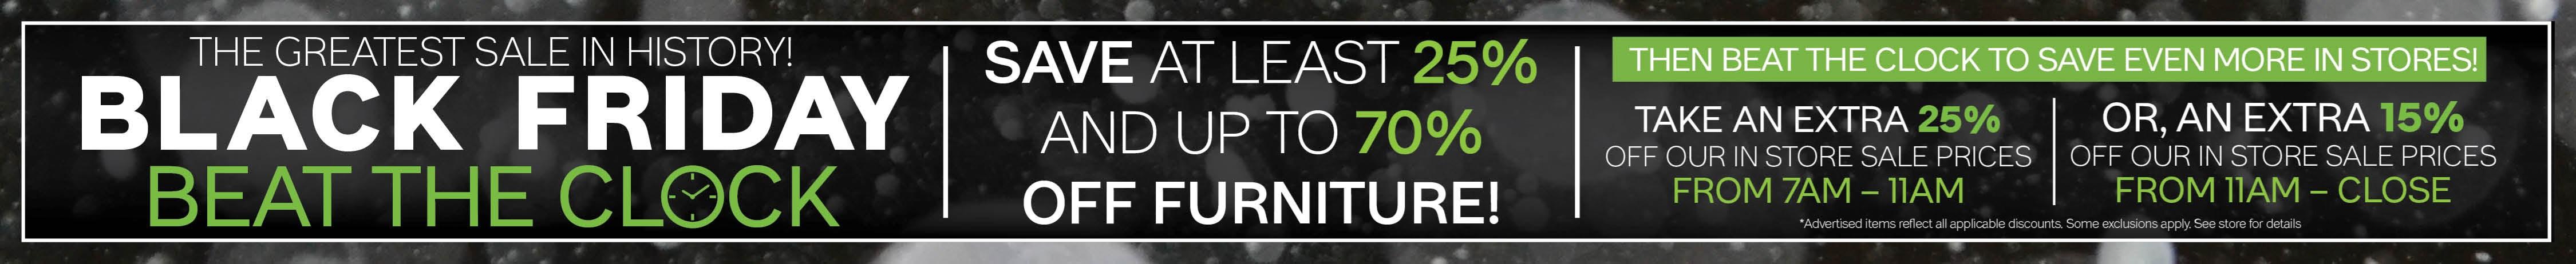 Furniture & ApplianceMart Black Friday Sale